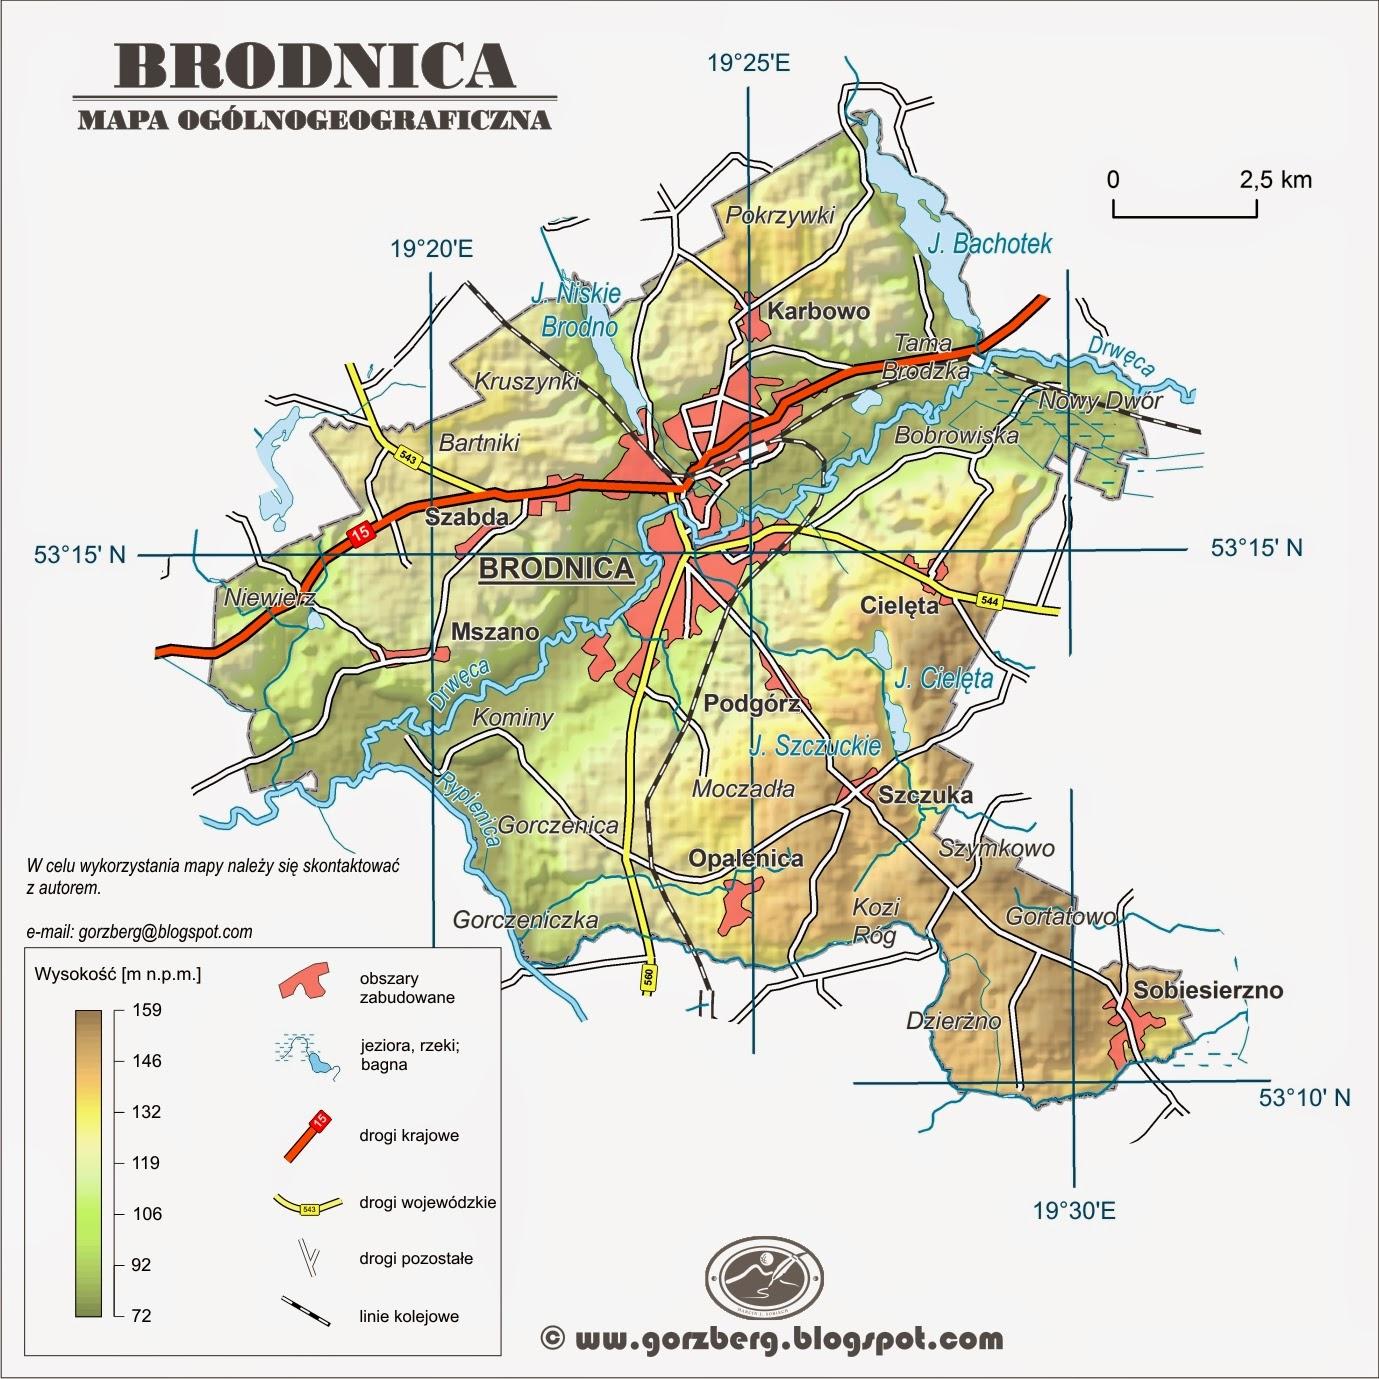 Mapa ogólnogeograficzna gminy Brodnica